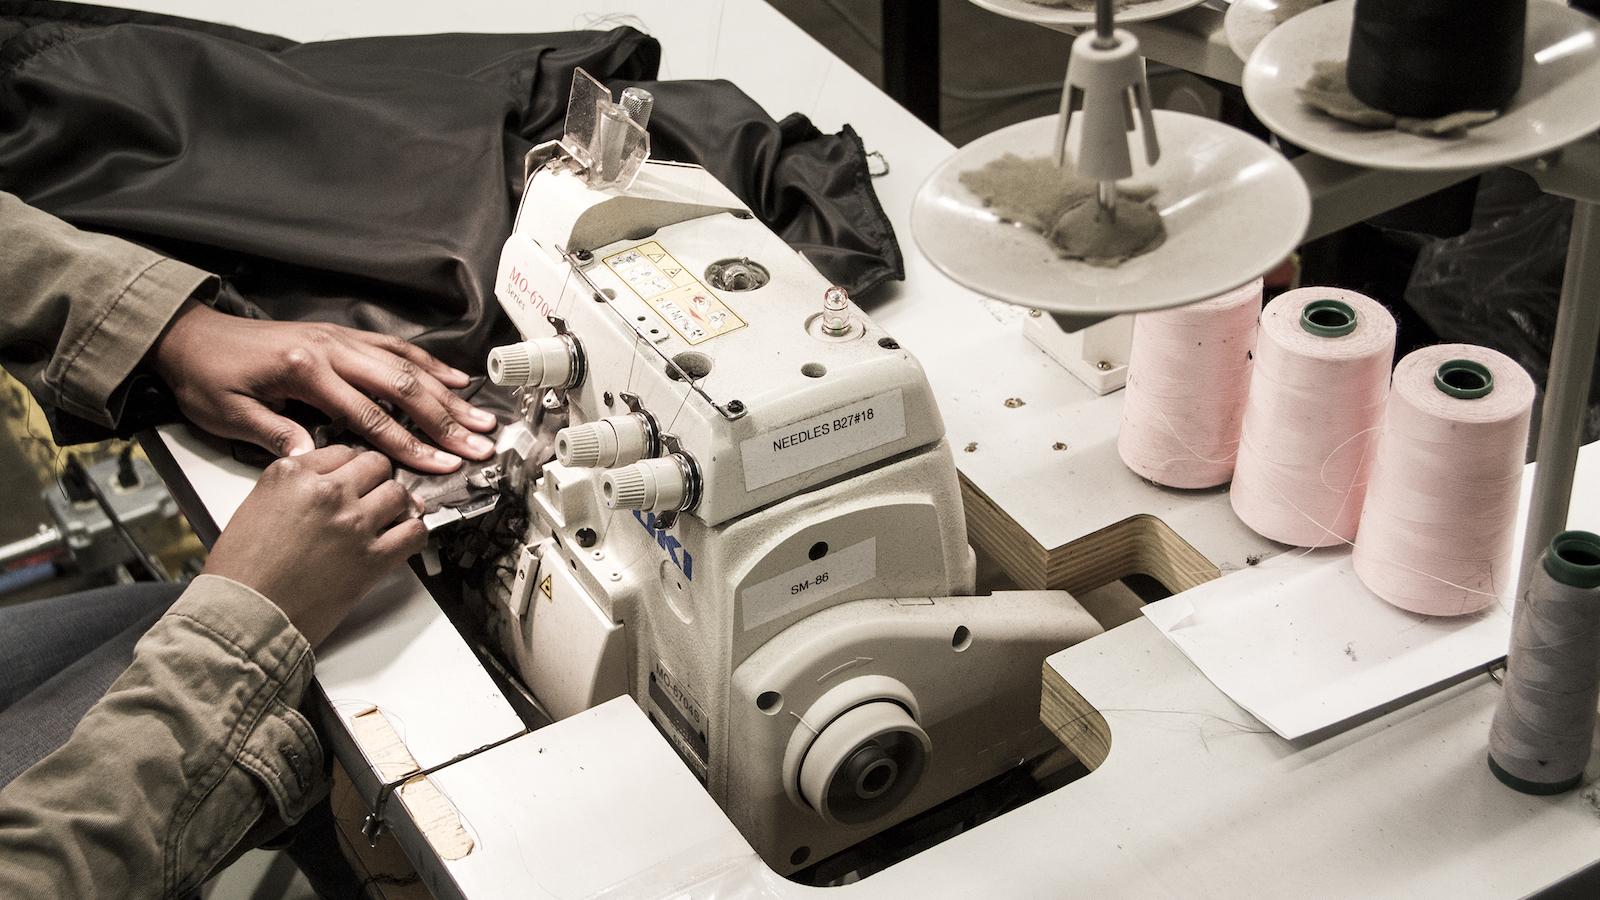 liberator sewing machine